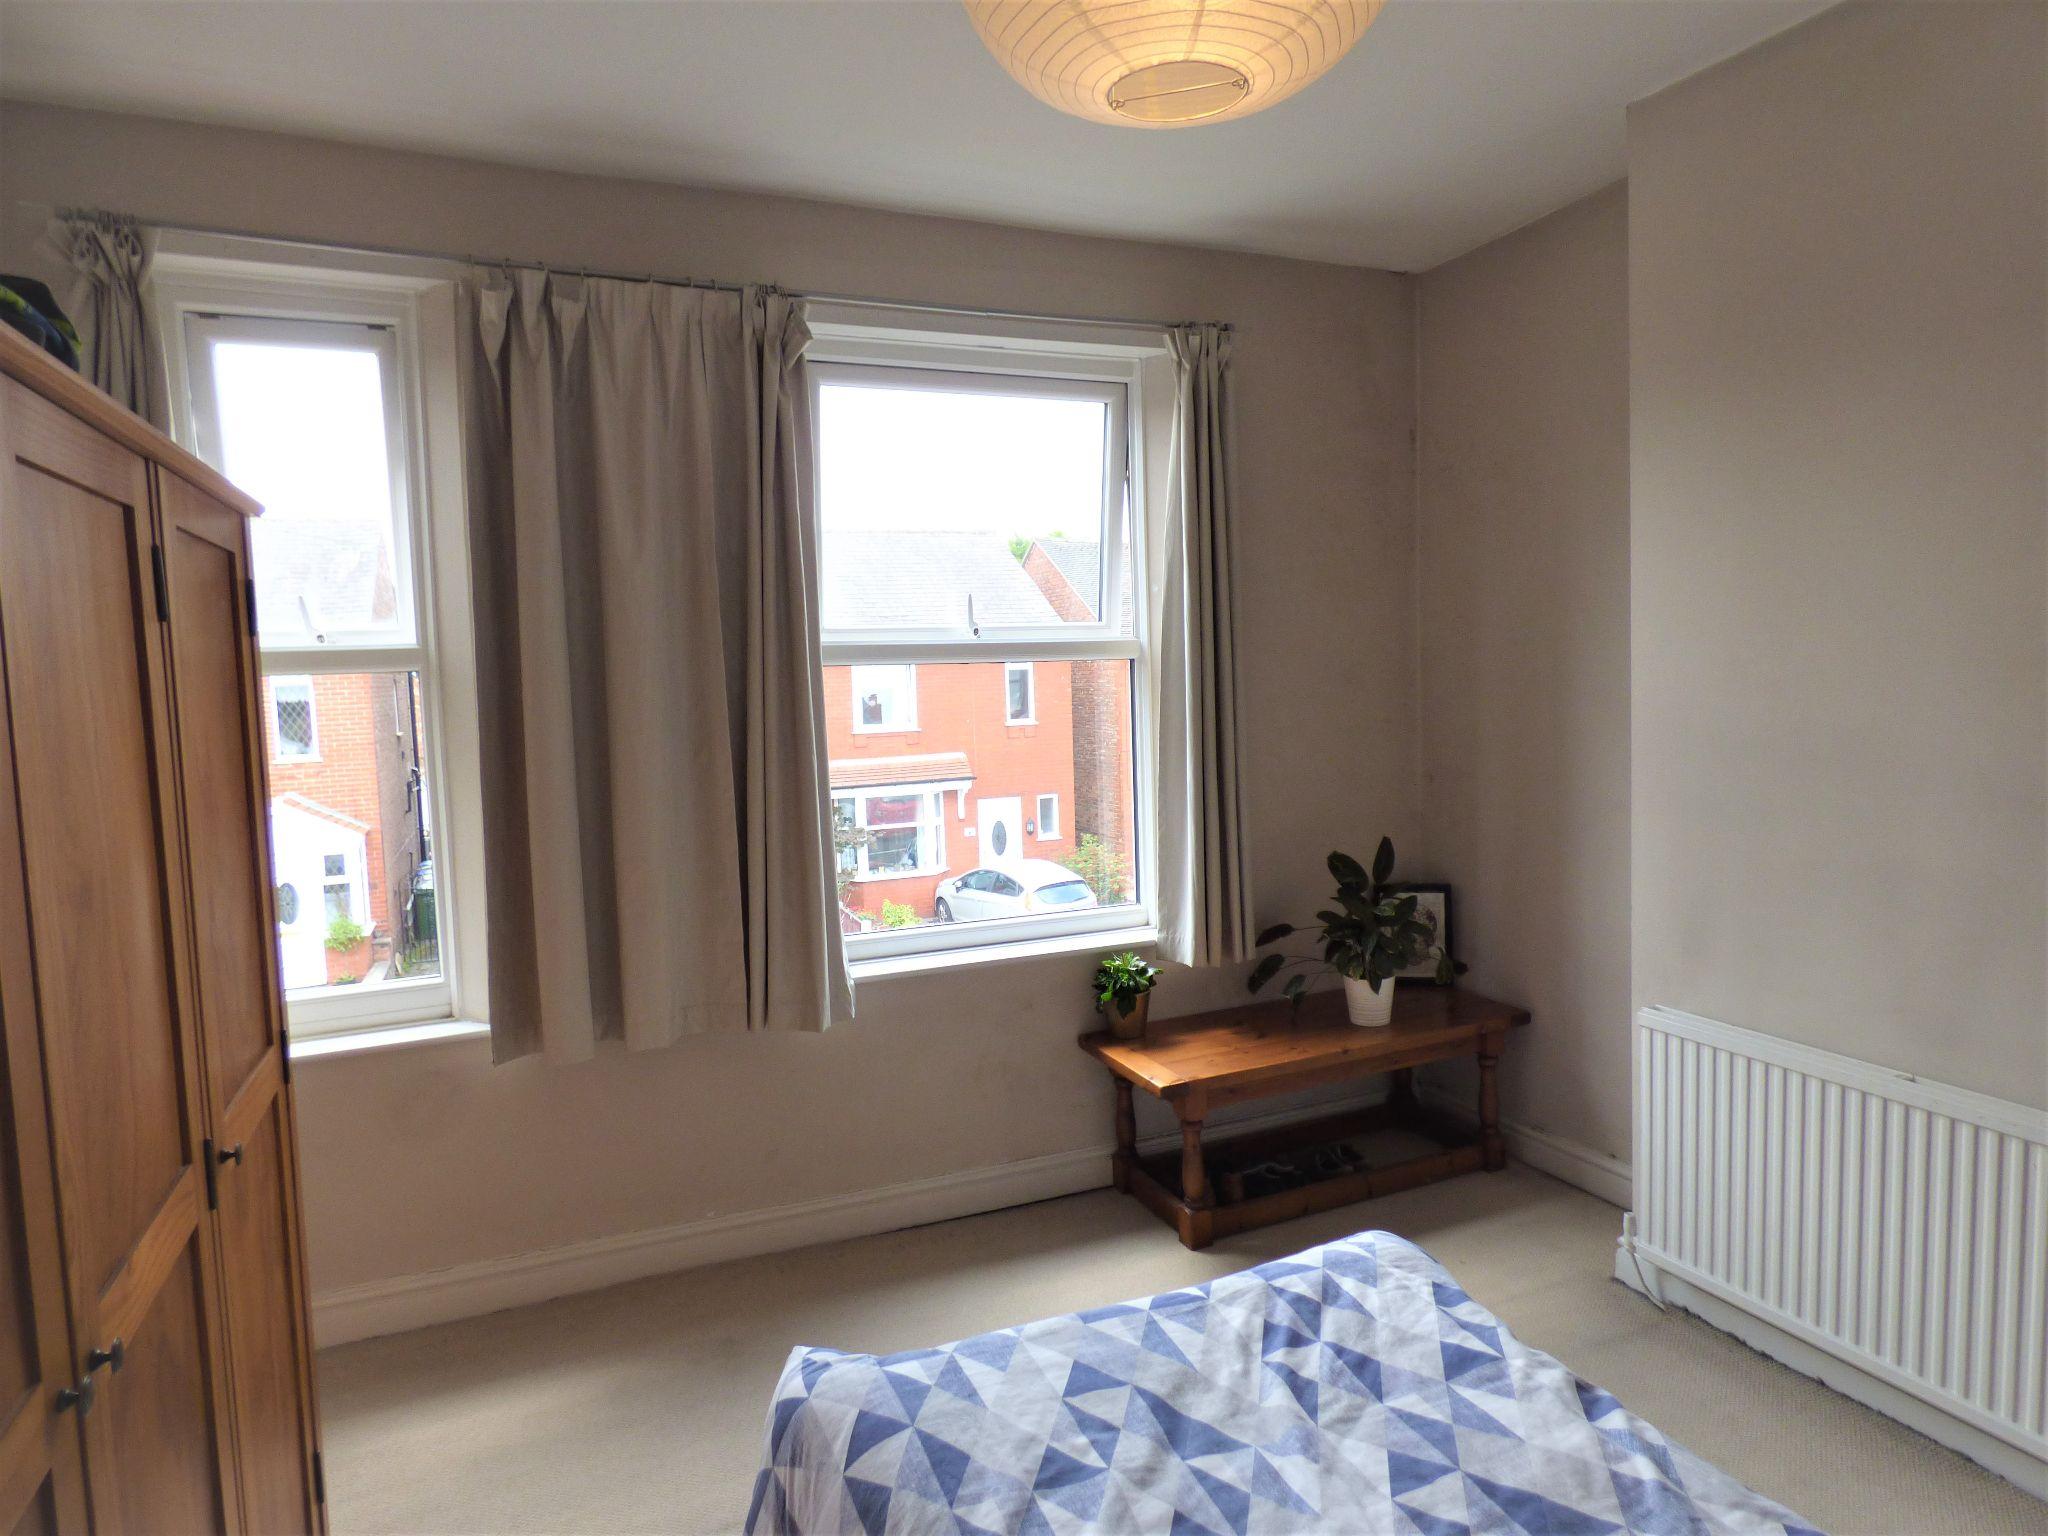 2 Bedroom Semi-detached House For Sale - Front Bedroom